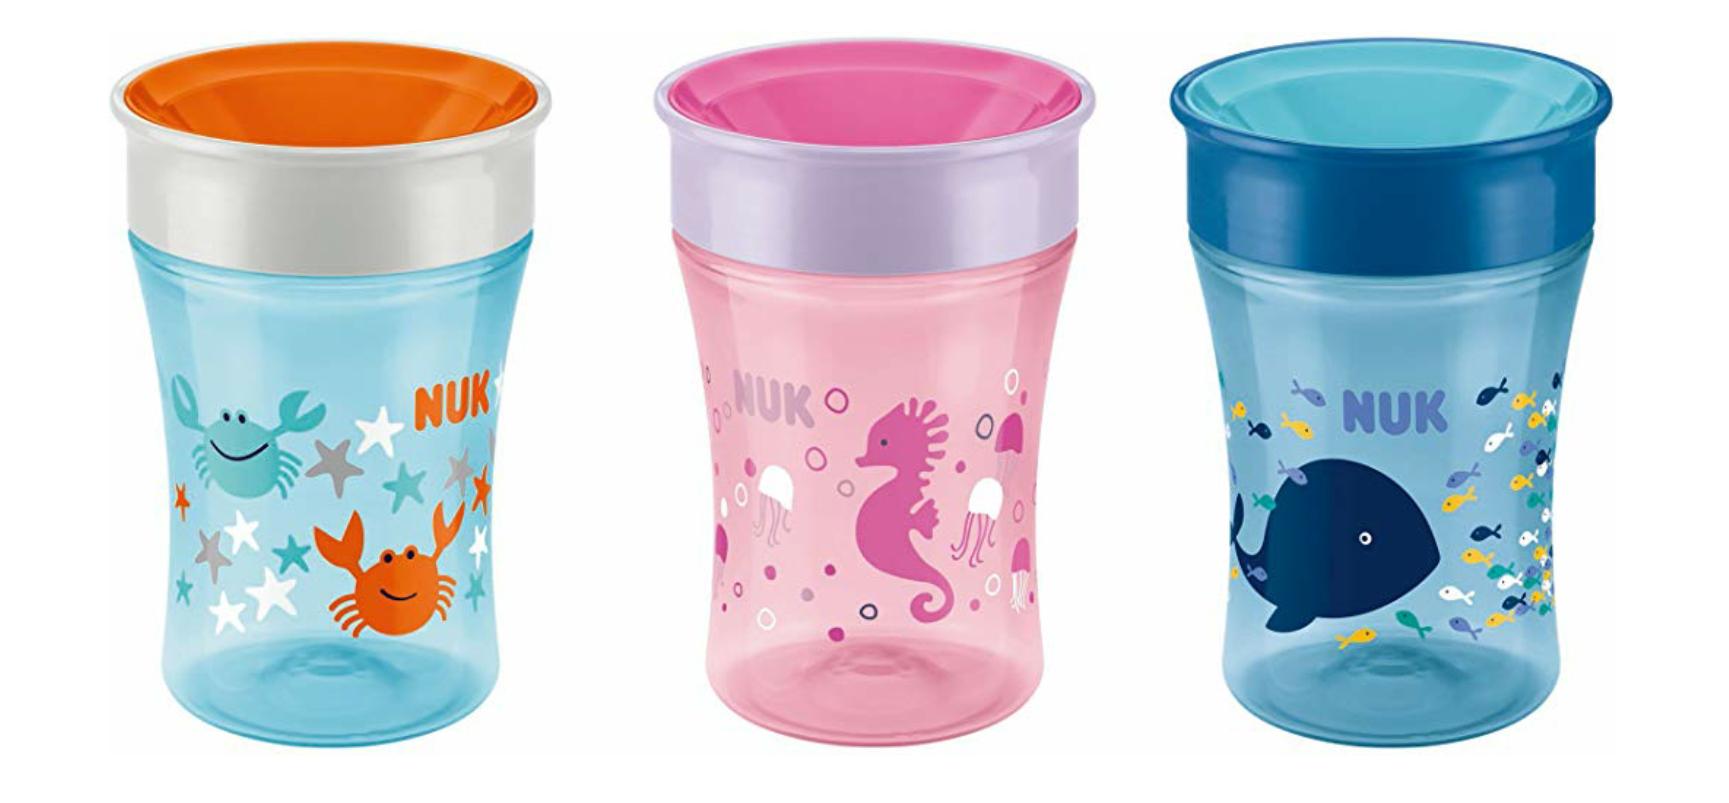 NUK Magic Cup Trinklernbecher, 360° Trinkrand, auslaufsicher, 230ml, Silikon, BPA-frei, vers. Designs // 2er-Pack m. Deckel 13,08€ [Prime]